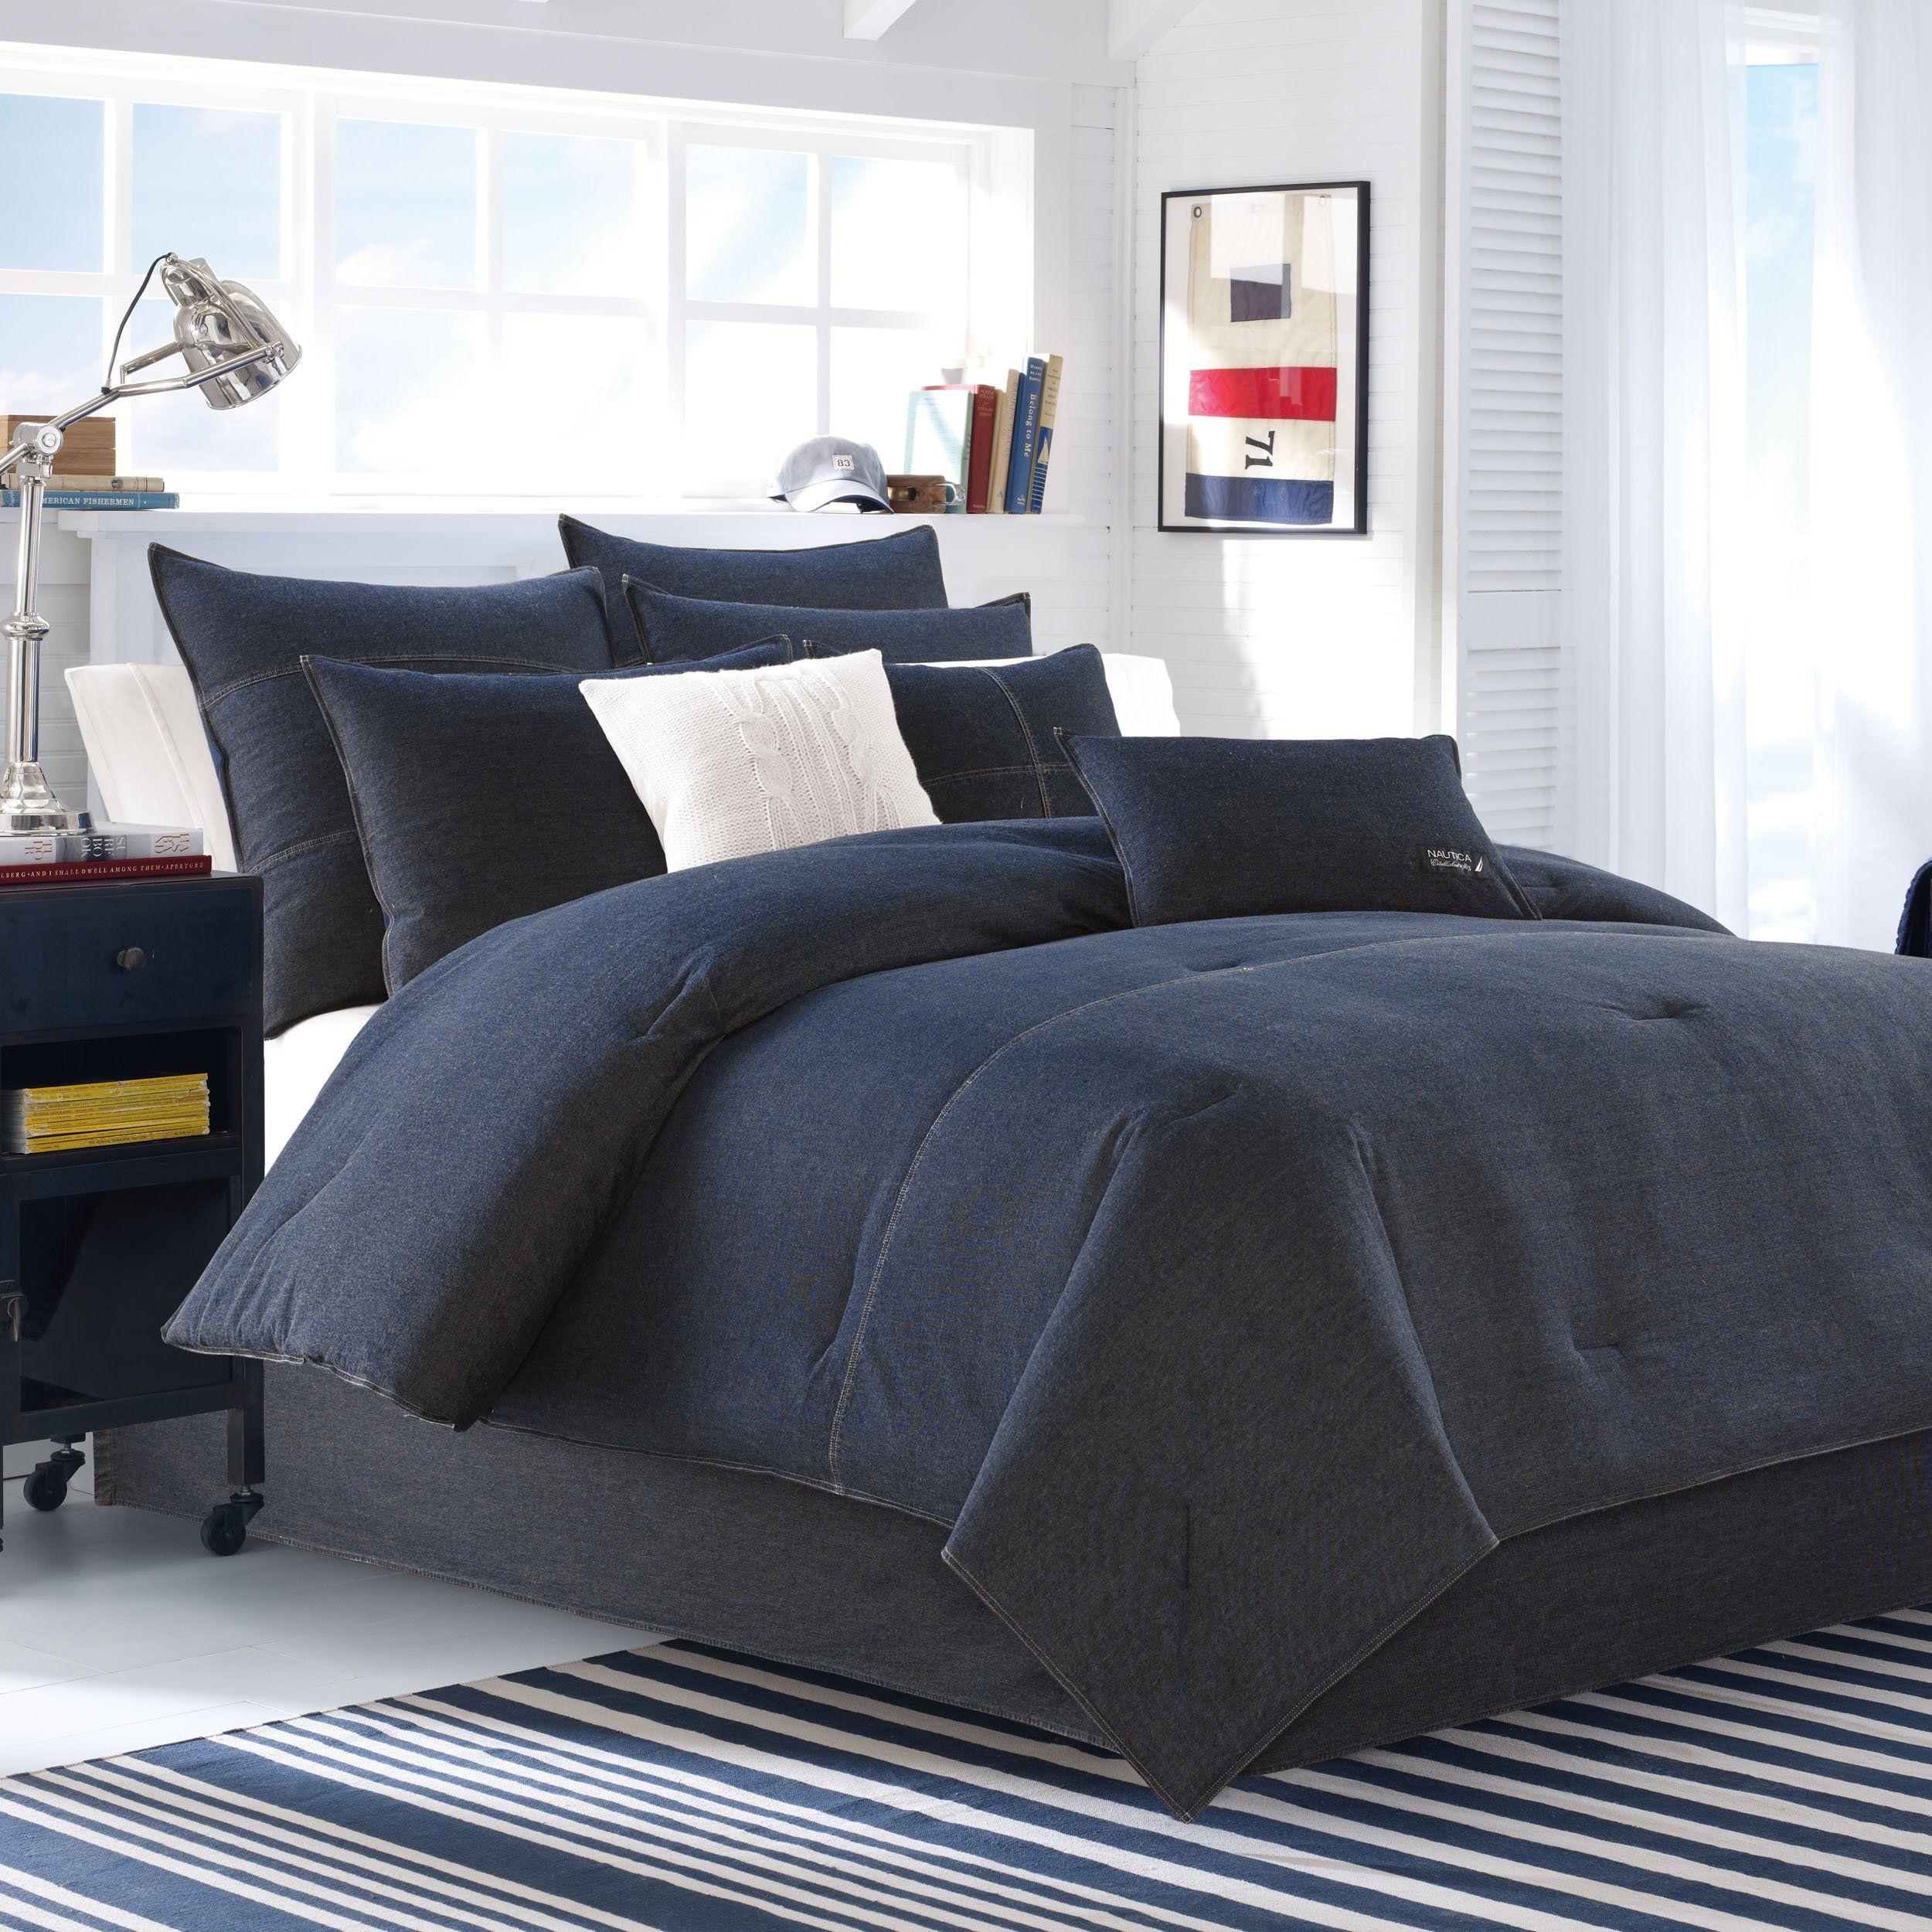 Nautica Seaward Denim Comforter Set Twin See This Great